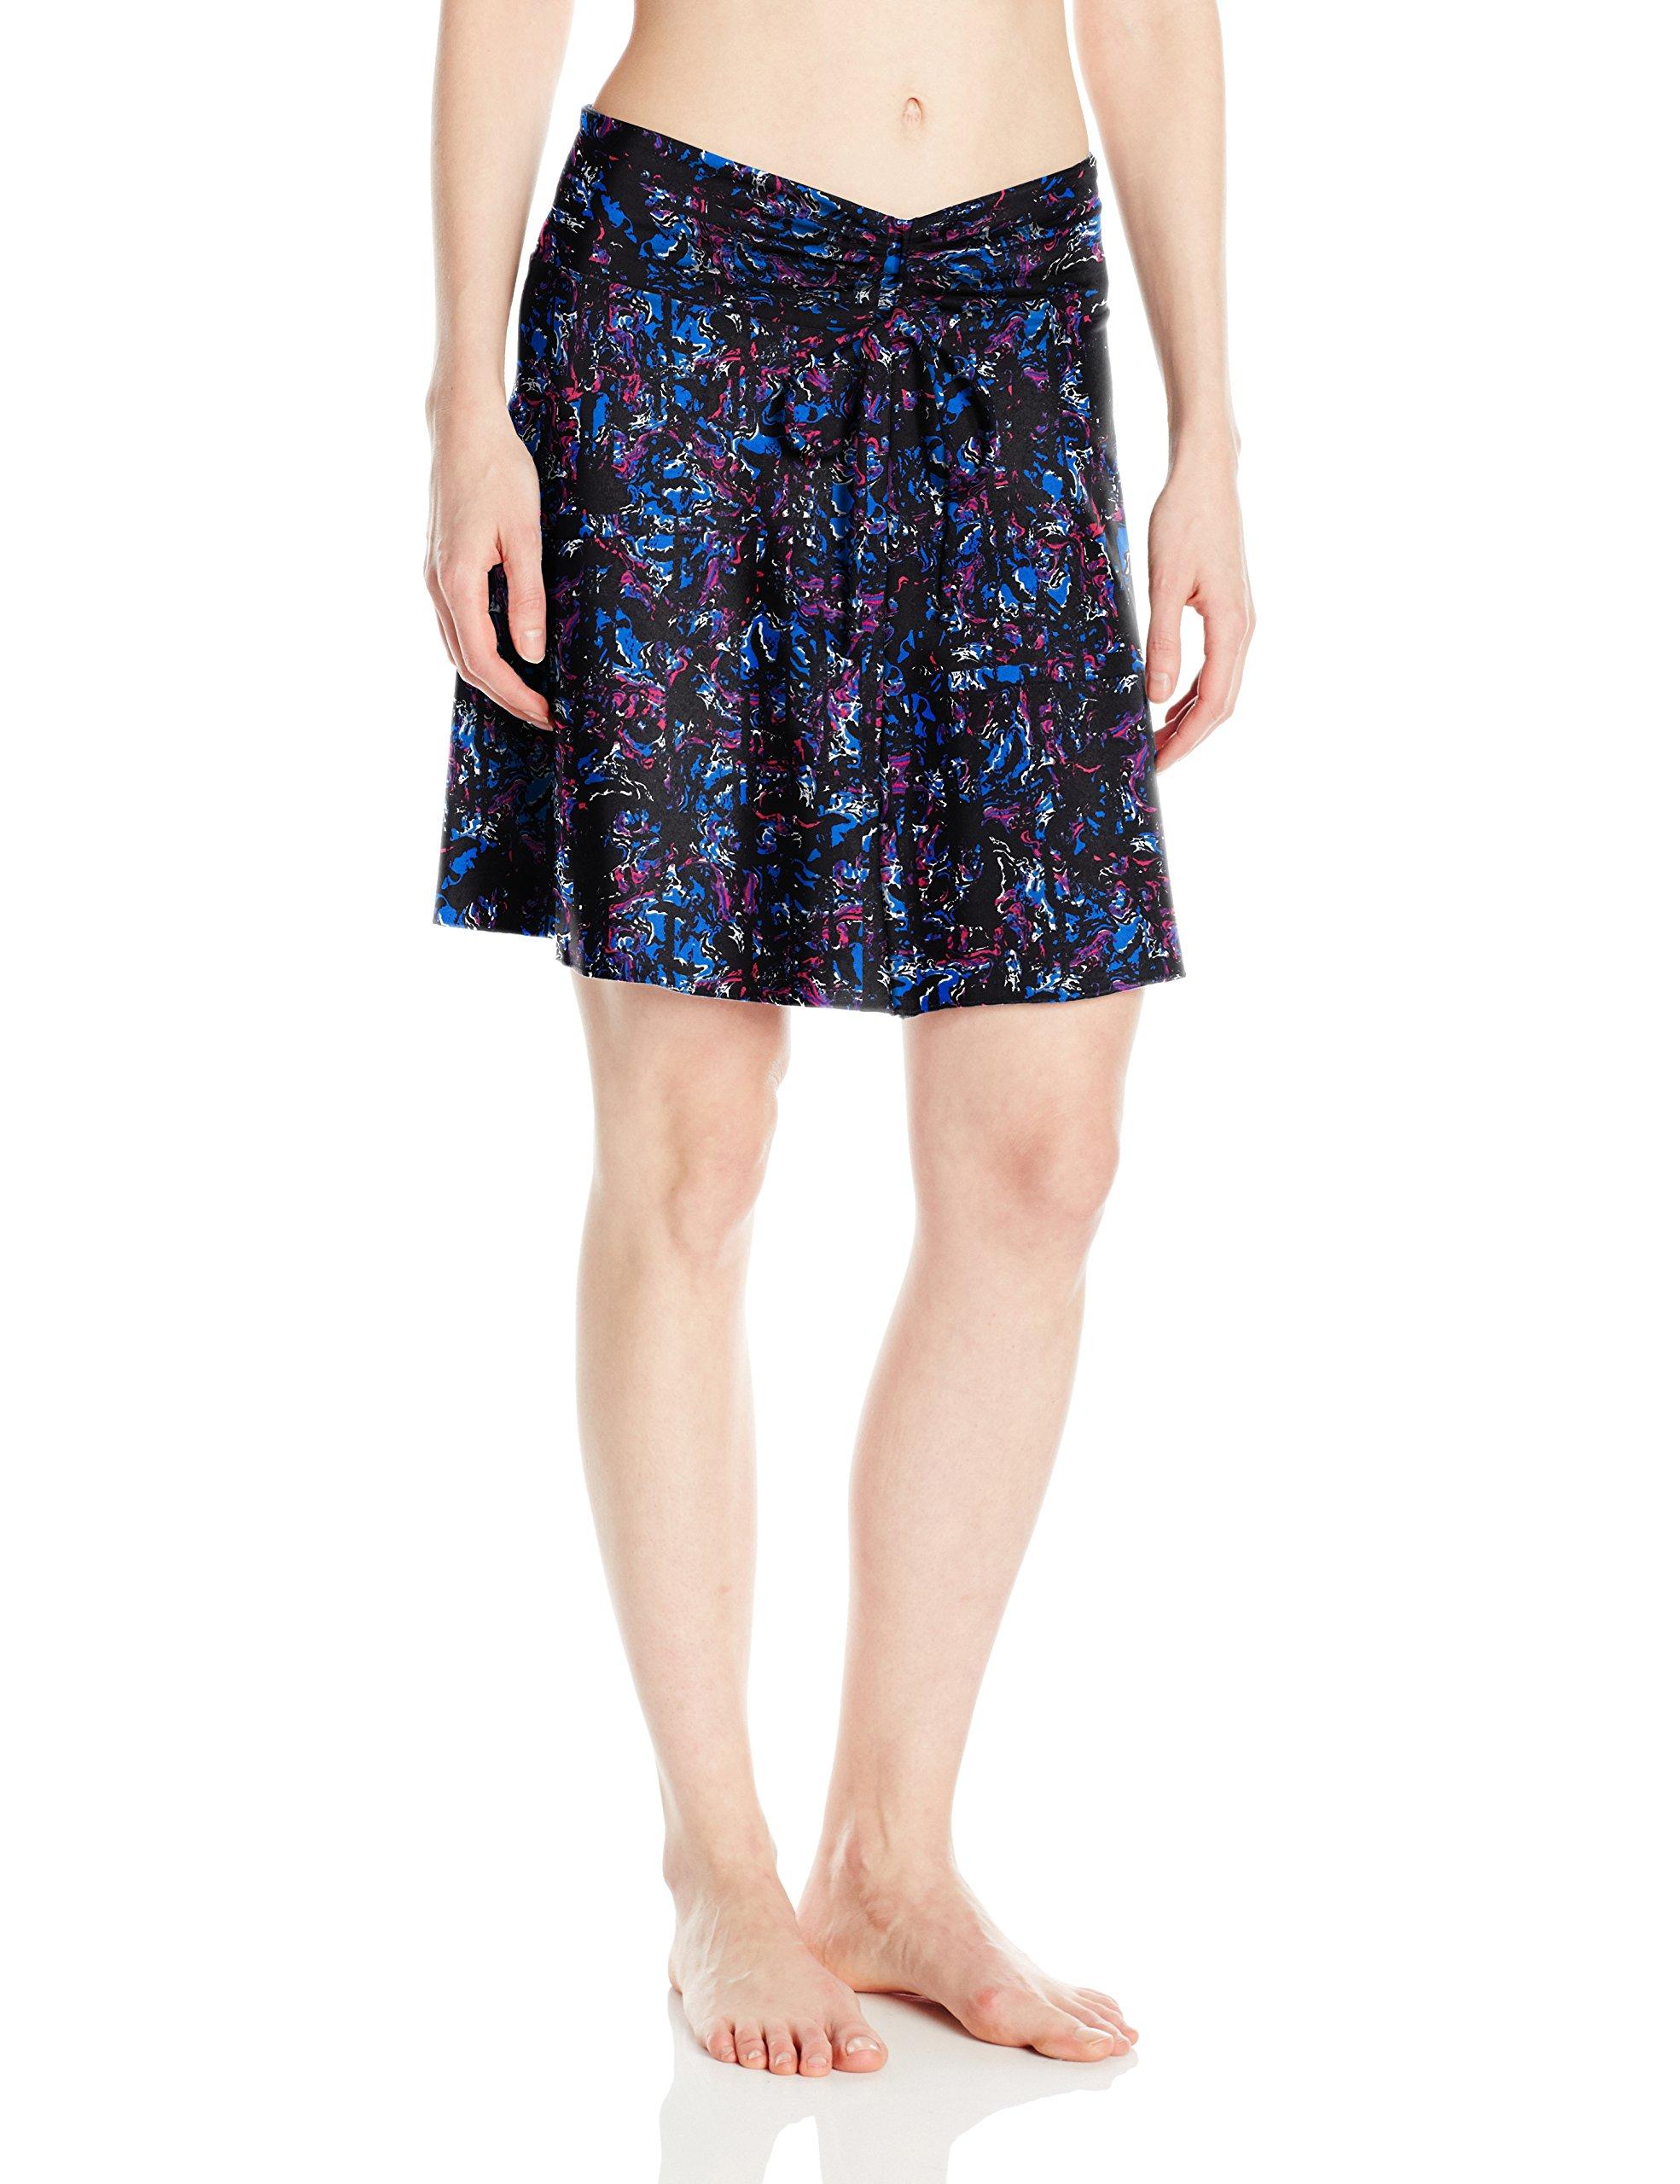 Soybu Women's Serendipity Skirt, Large, Slick by Soybu